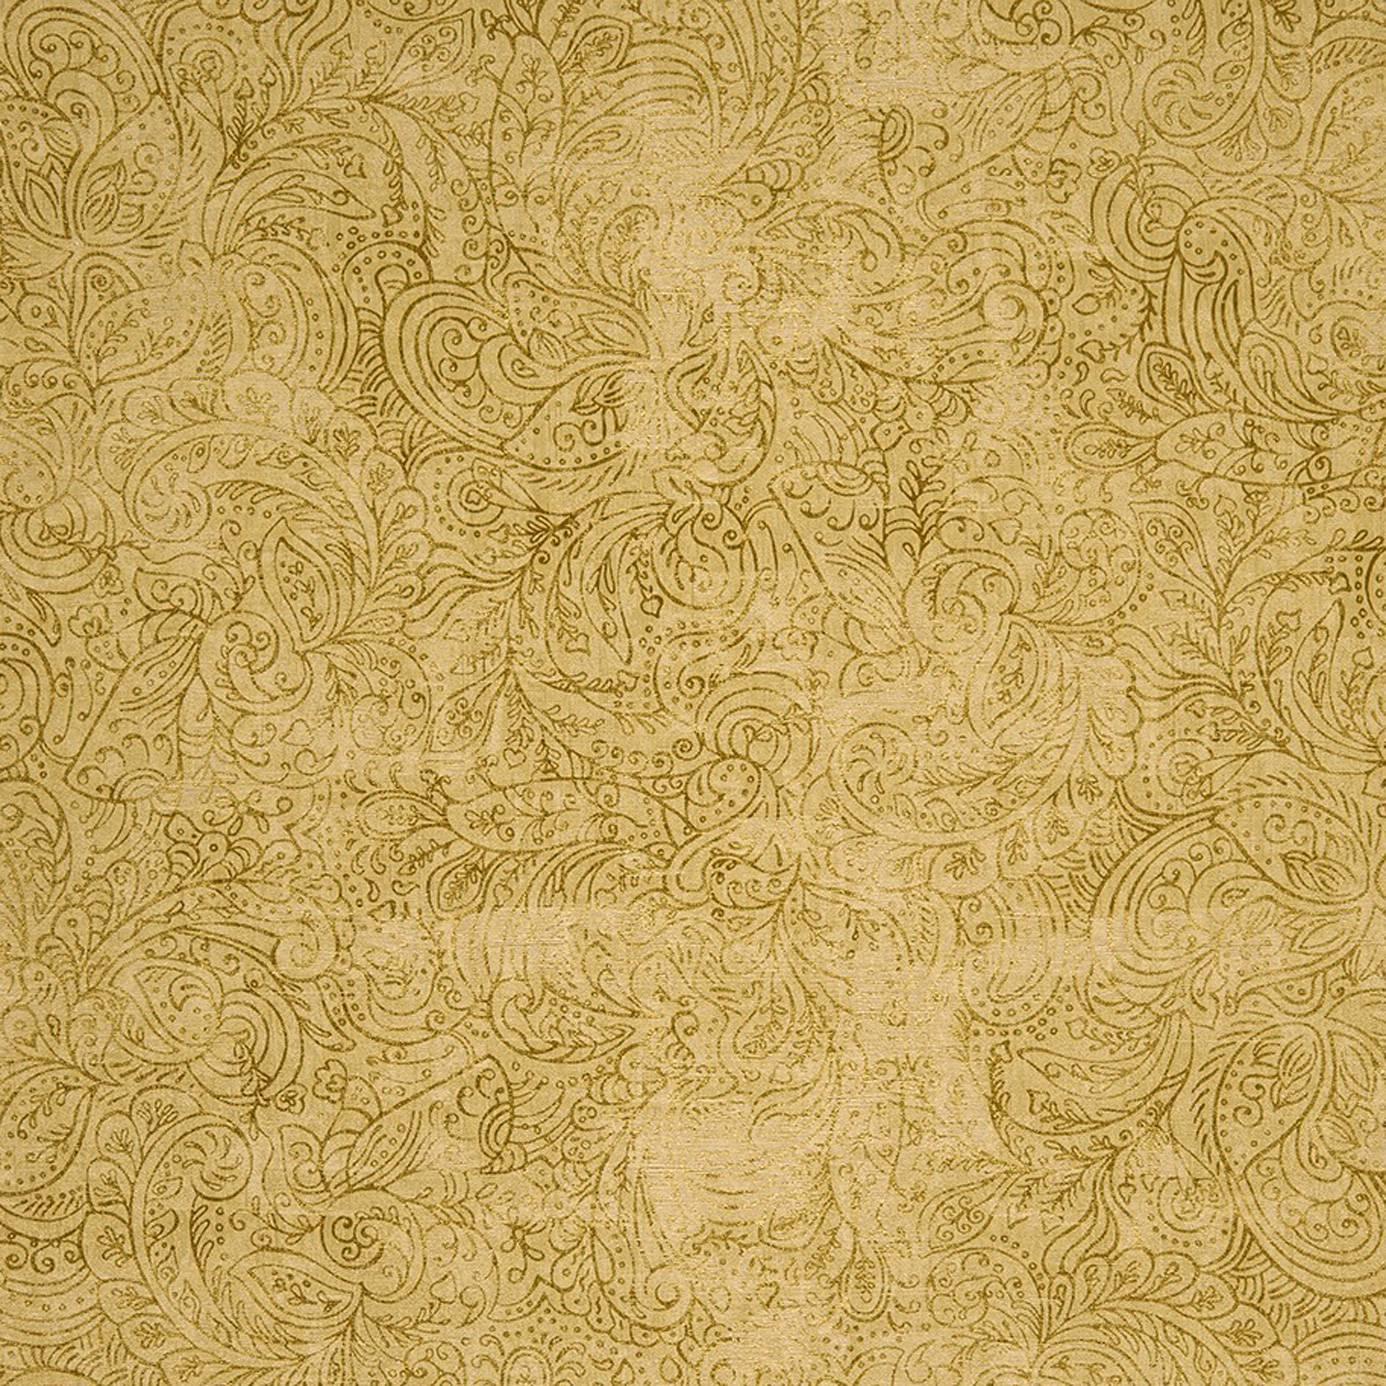 Французские обои Casadeco,  коллекция Majestic, артикул26432522